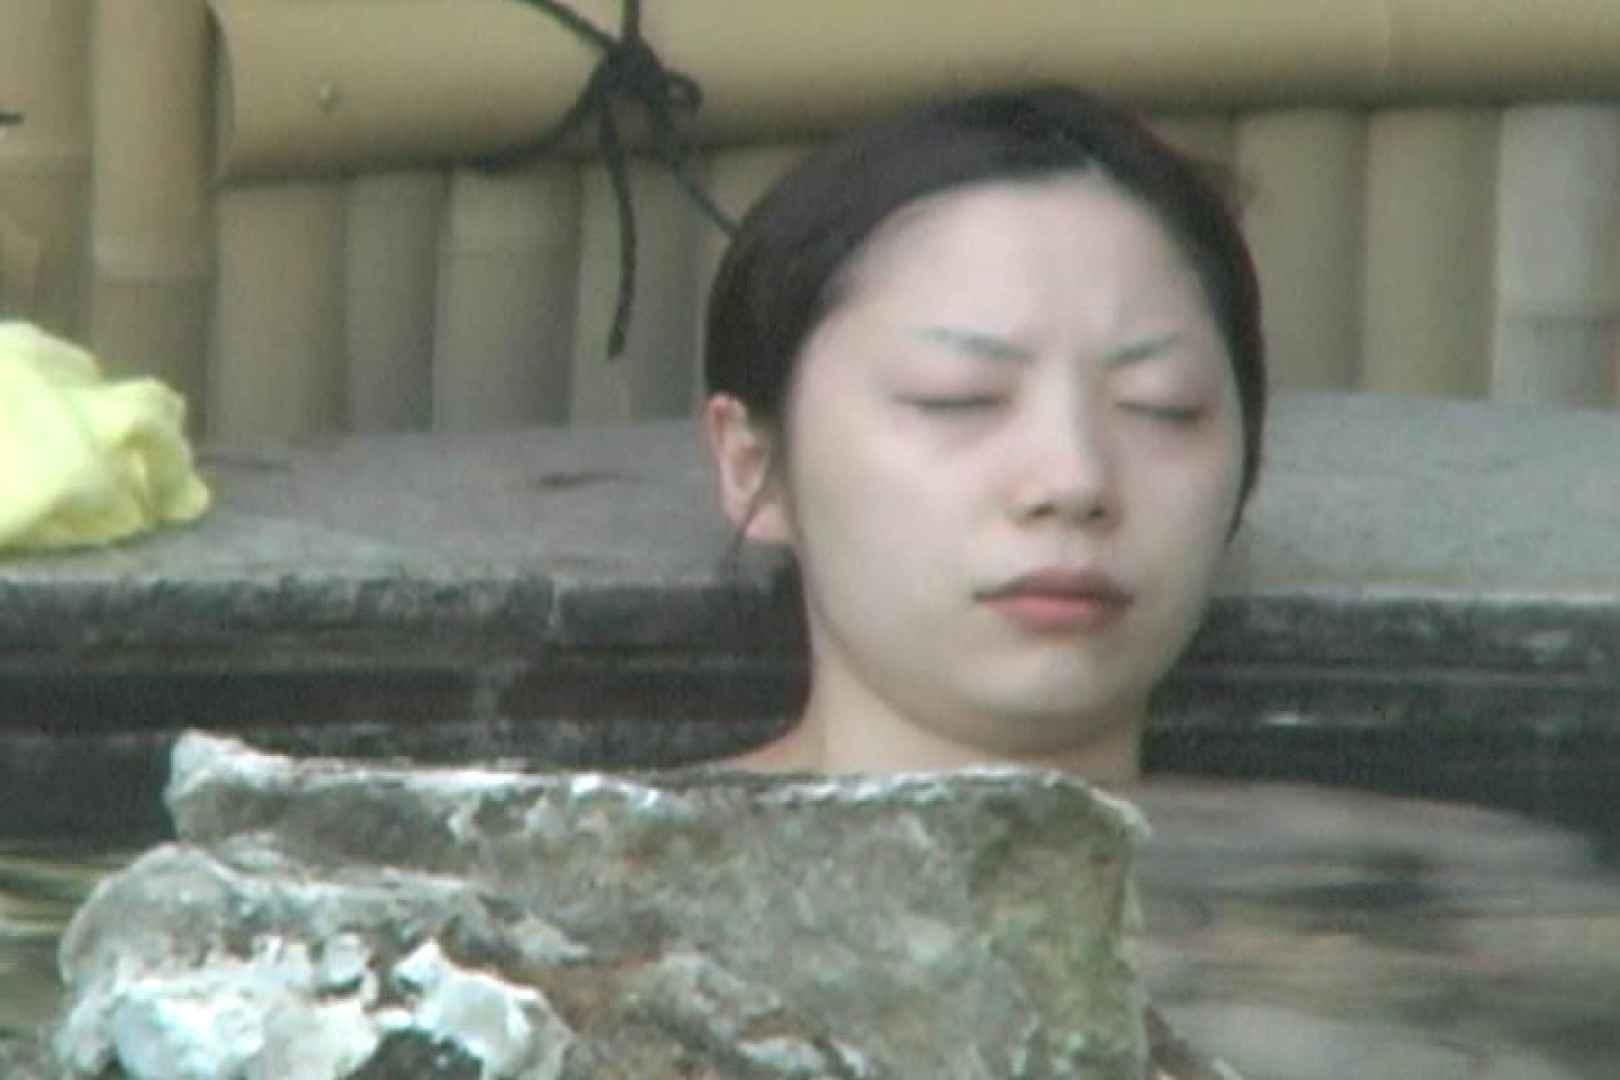 Aquaな露天風呂Vol.596 露天 覗きおまんこ画像 77画像 53